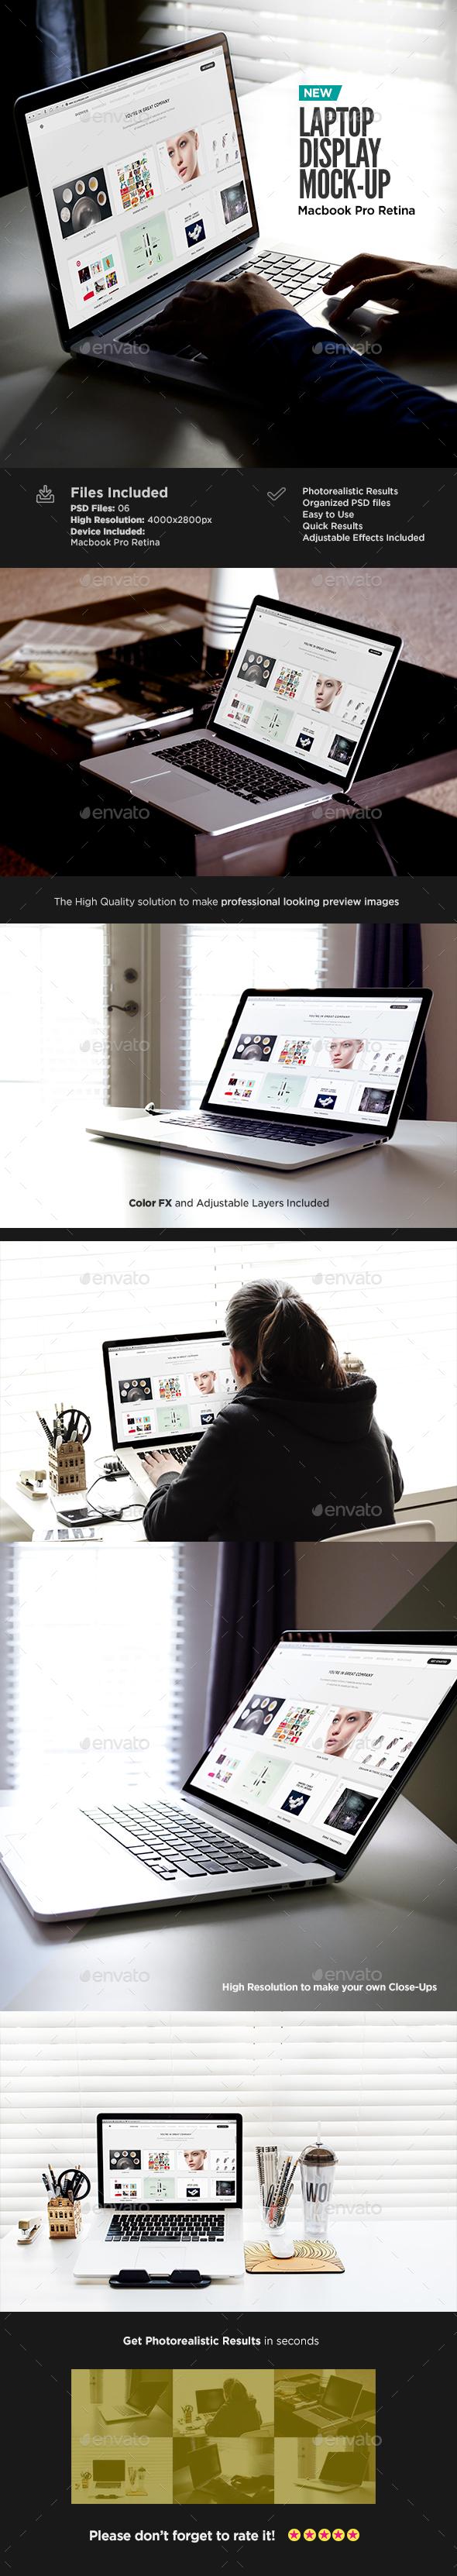 Macbook Retina Display Mock-Up  - Laptop Displays